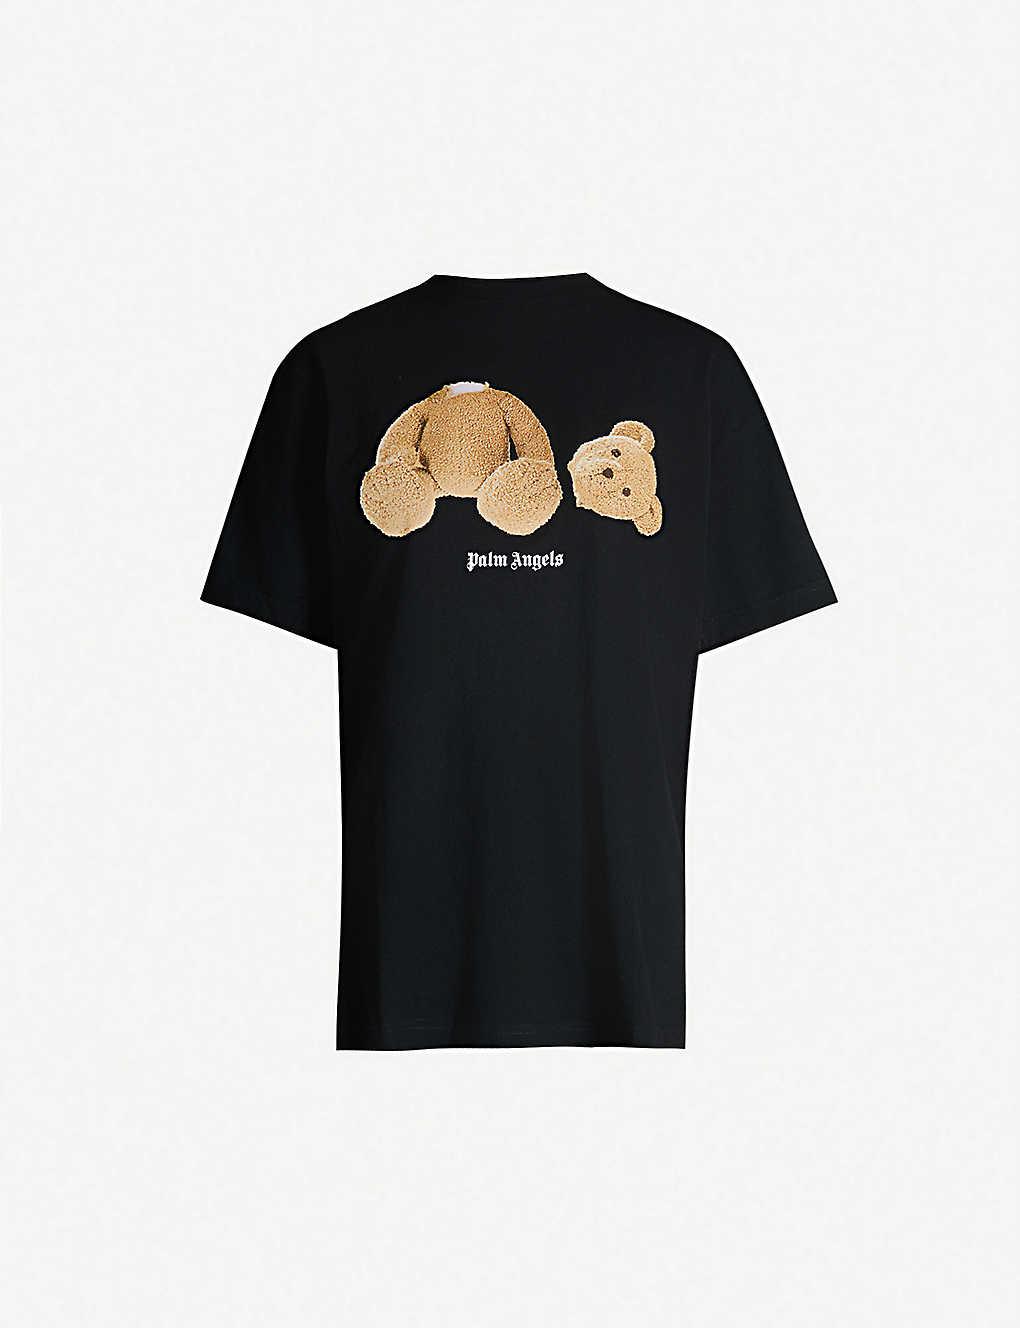 aa54849eea0 PALM ANGELS - Kill The Bear boy-fit cotton-jersey T-shirt | Selfridges.com